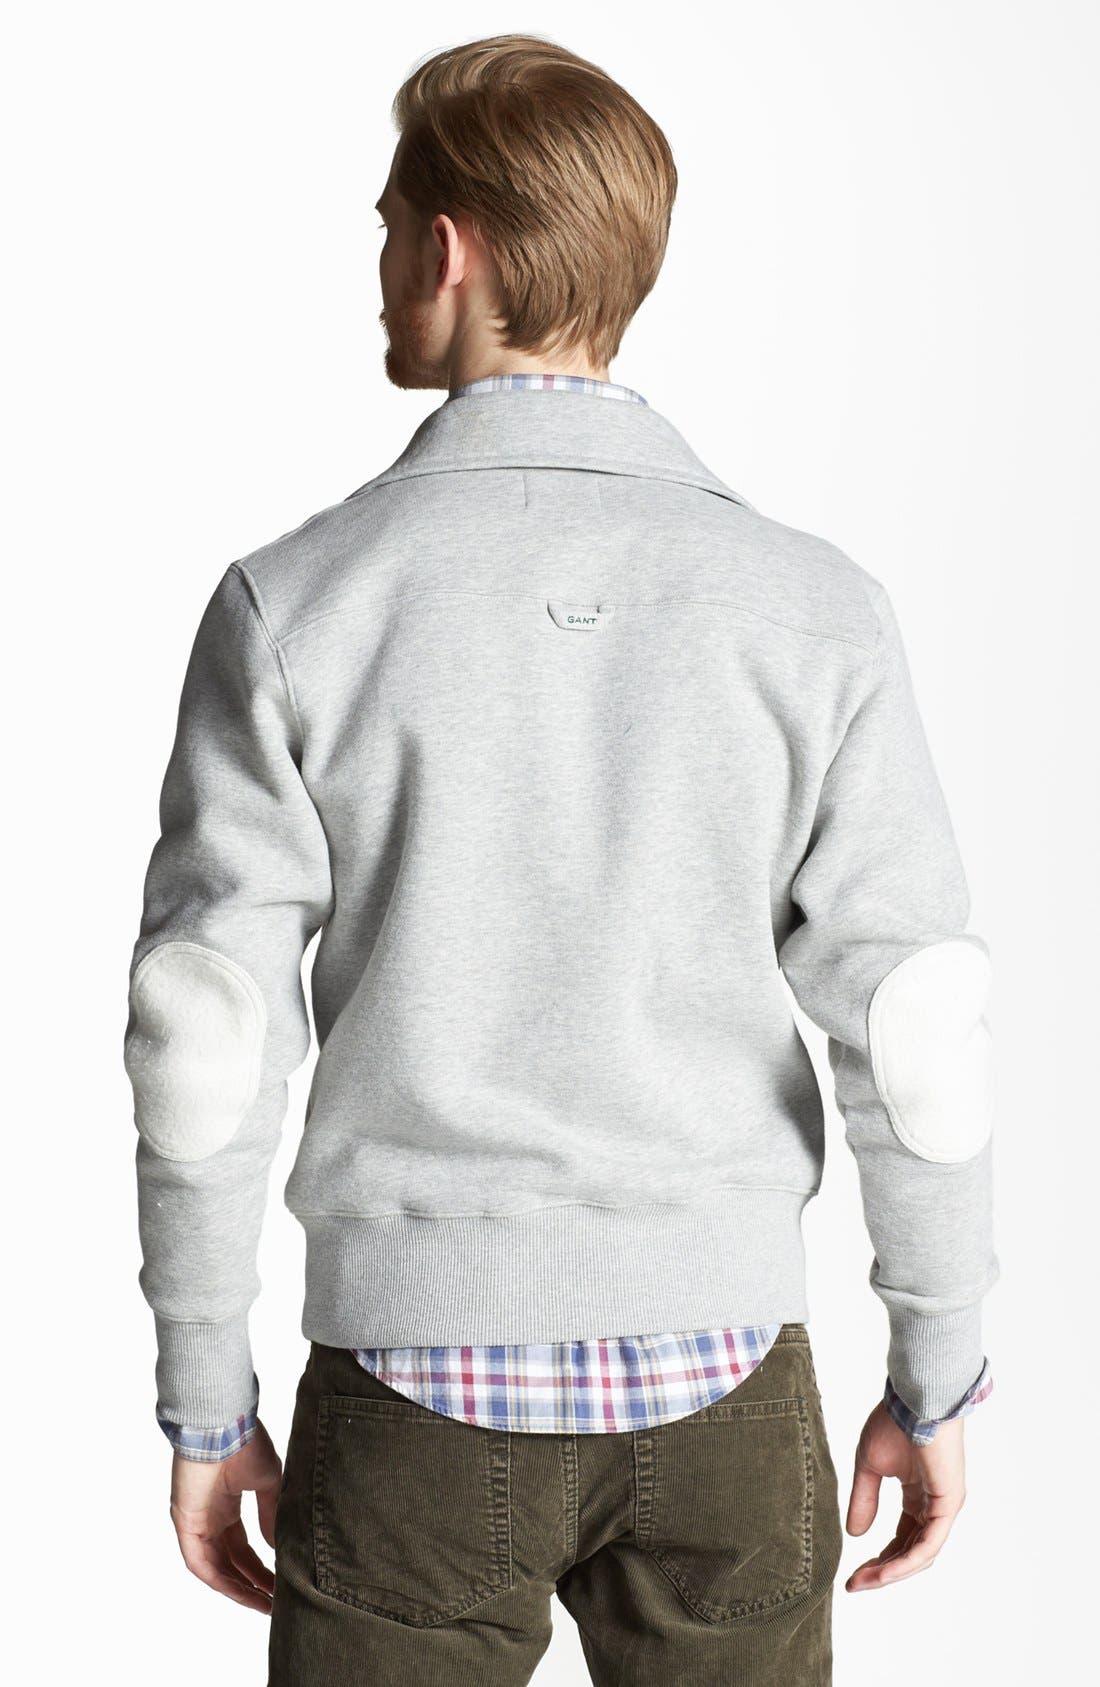 Alternate Image 2  - Gant by Michael Bastian Half-Zip Pullover Sweatshirt